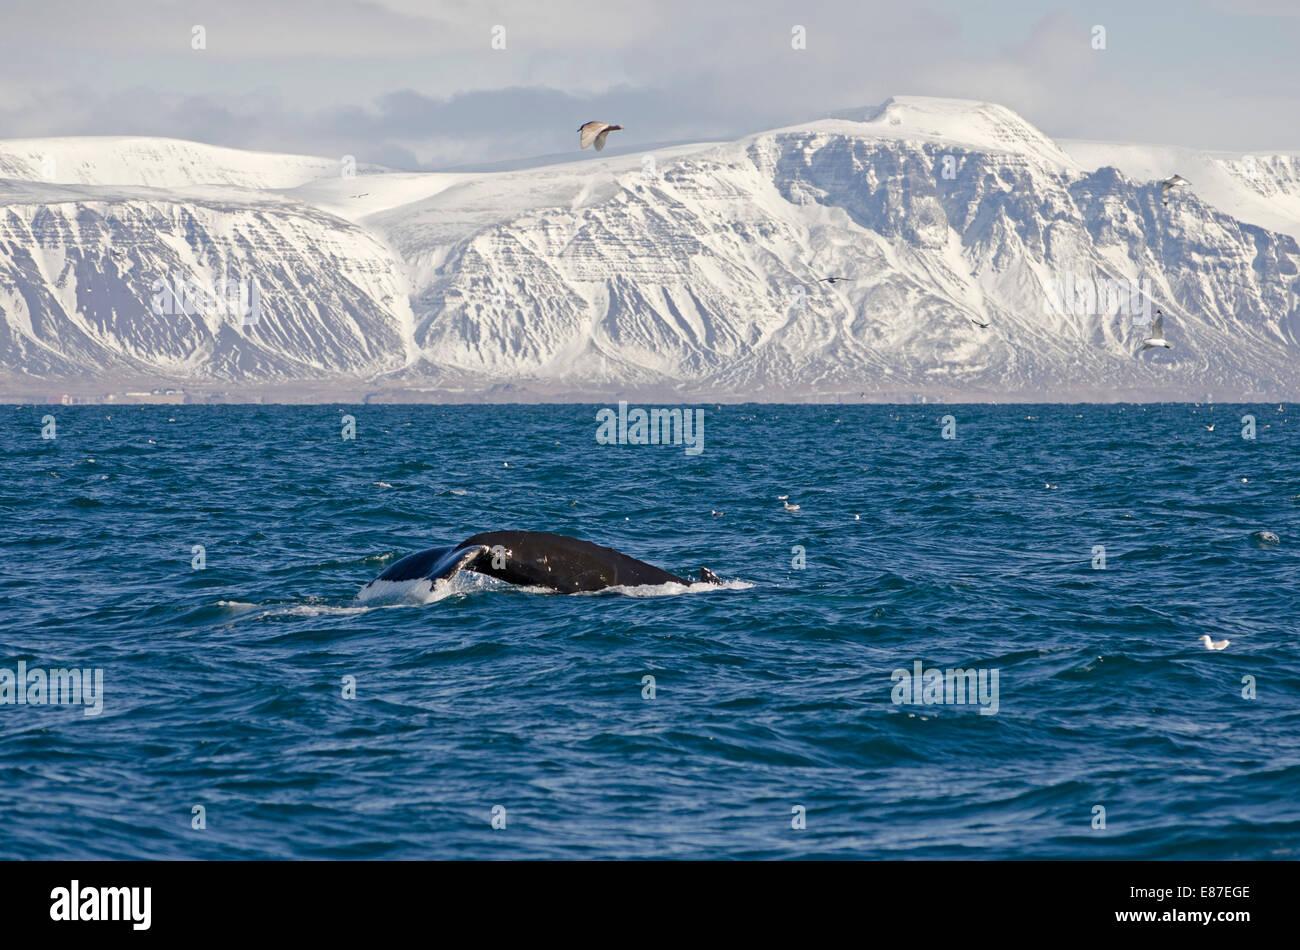 Humpback whale (Megaptera novaeangliae), Faxafloi Bay, Southwest Iceland. - Stock Image